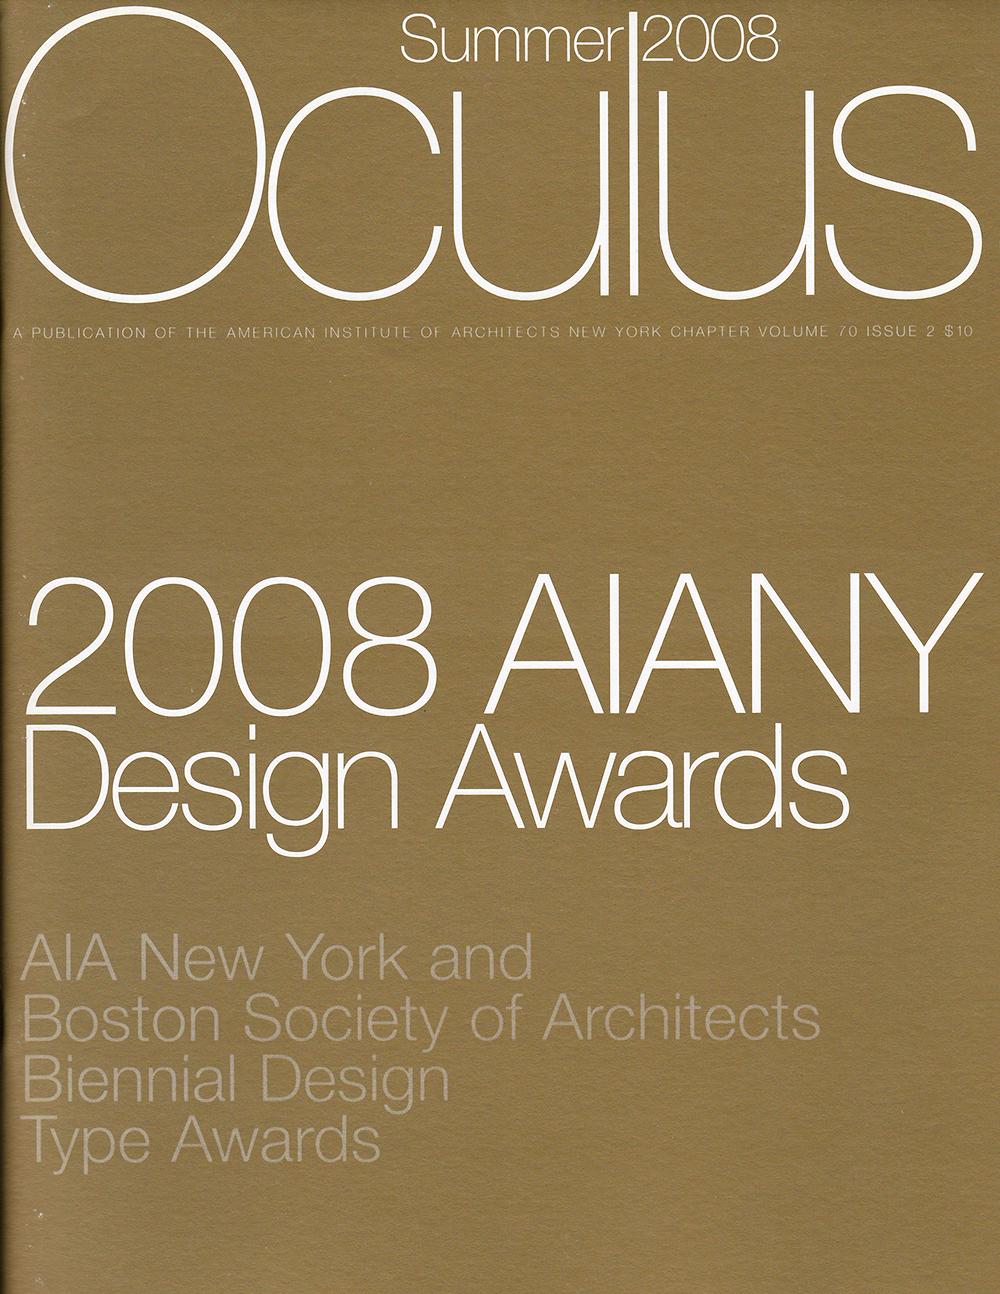 AIANY, 2008 Design Awards, Ali Hocek, Oculus